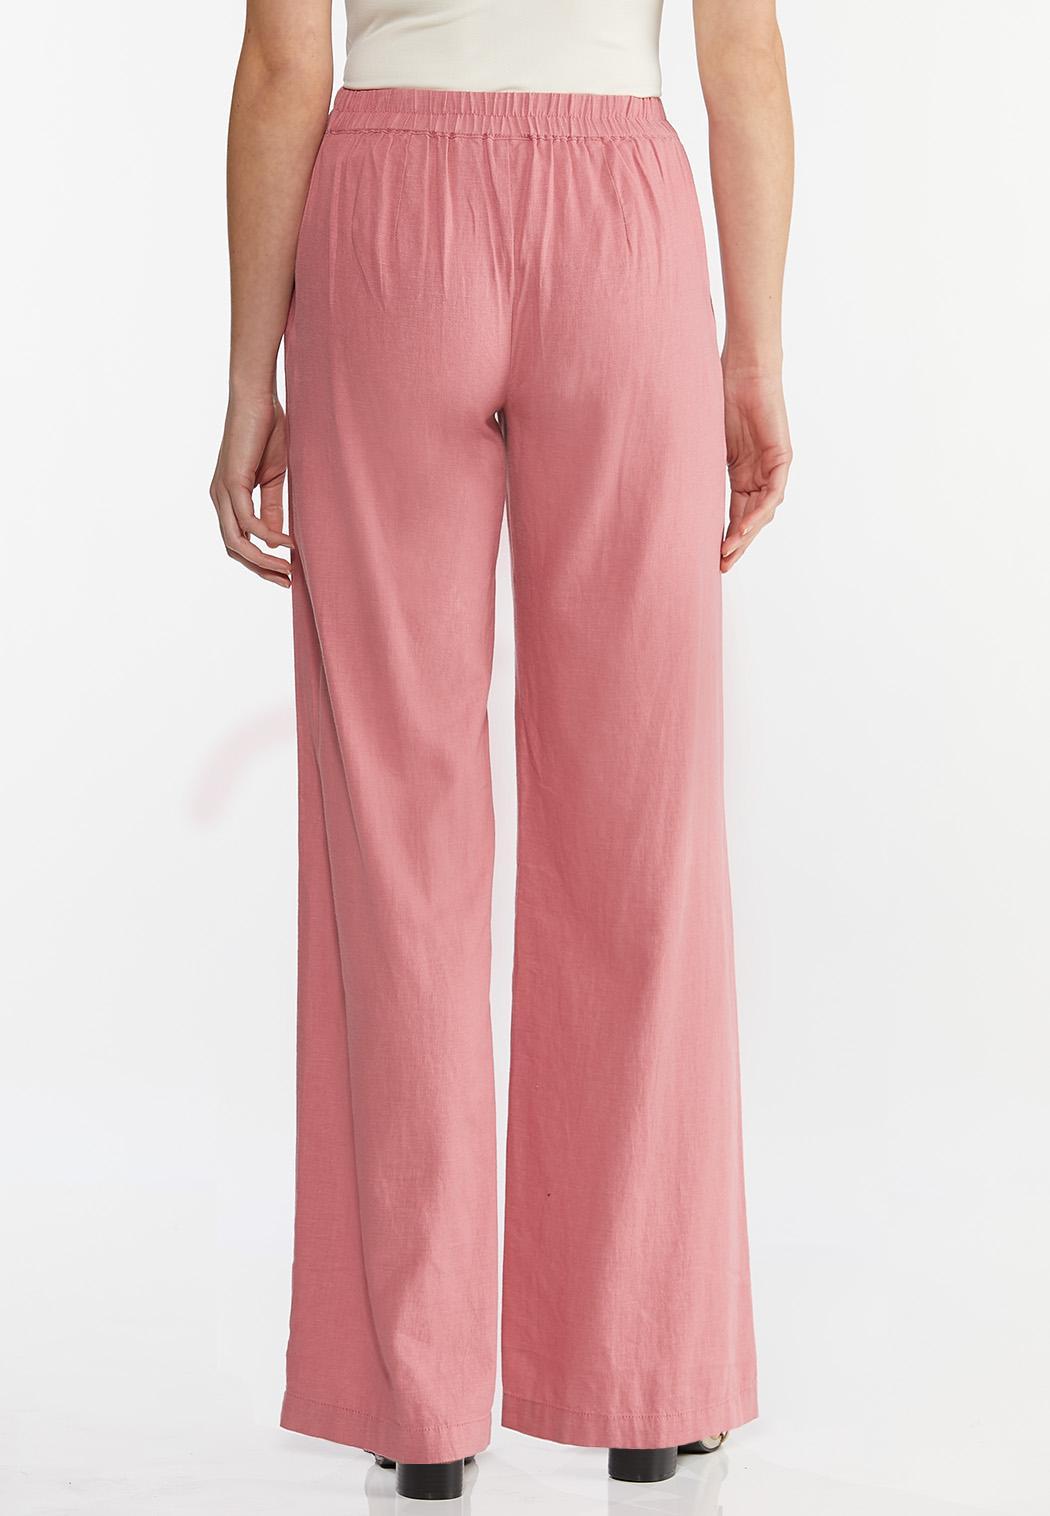 Rose Linen Pants (Item #44456486)